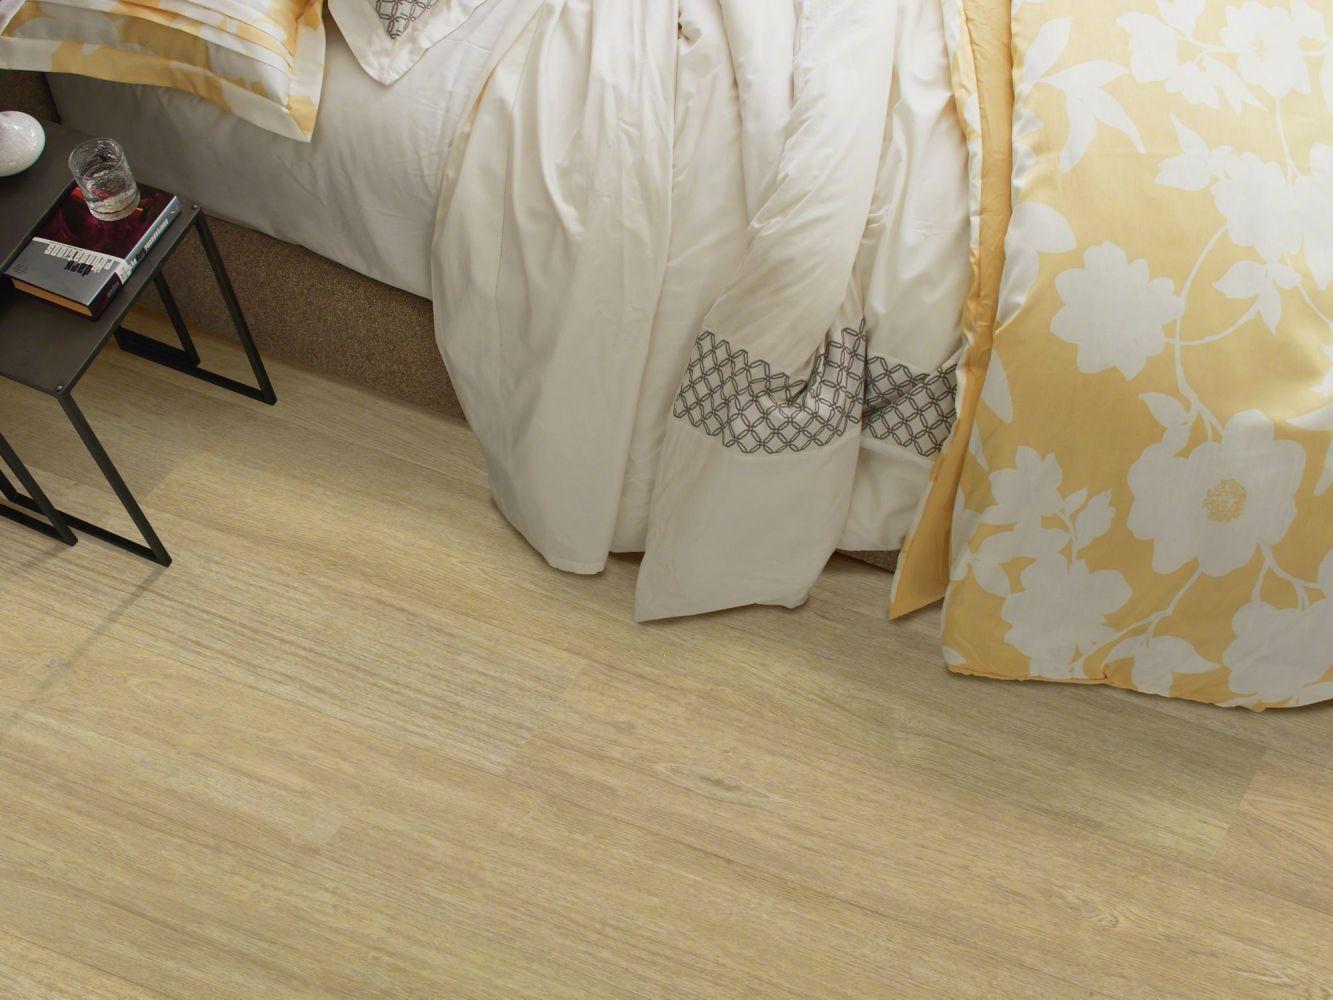 Shaw Floors Resilient Residential Alto Plank Cervati 00205_0543V